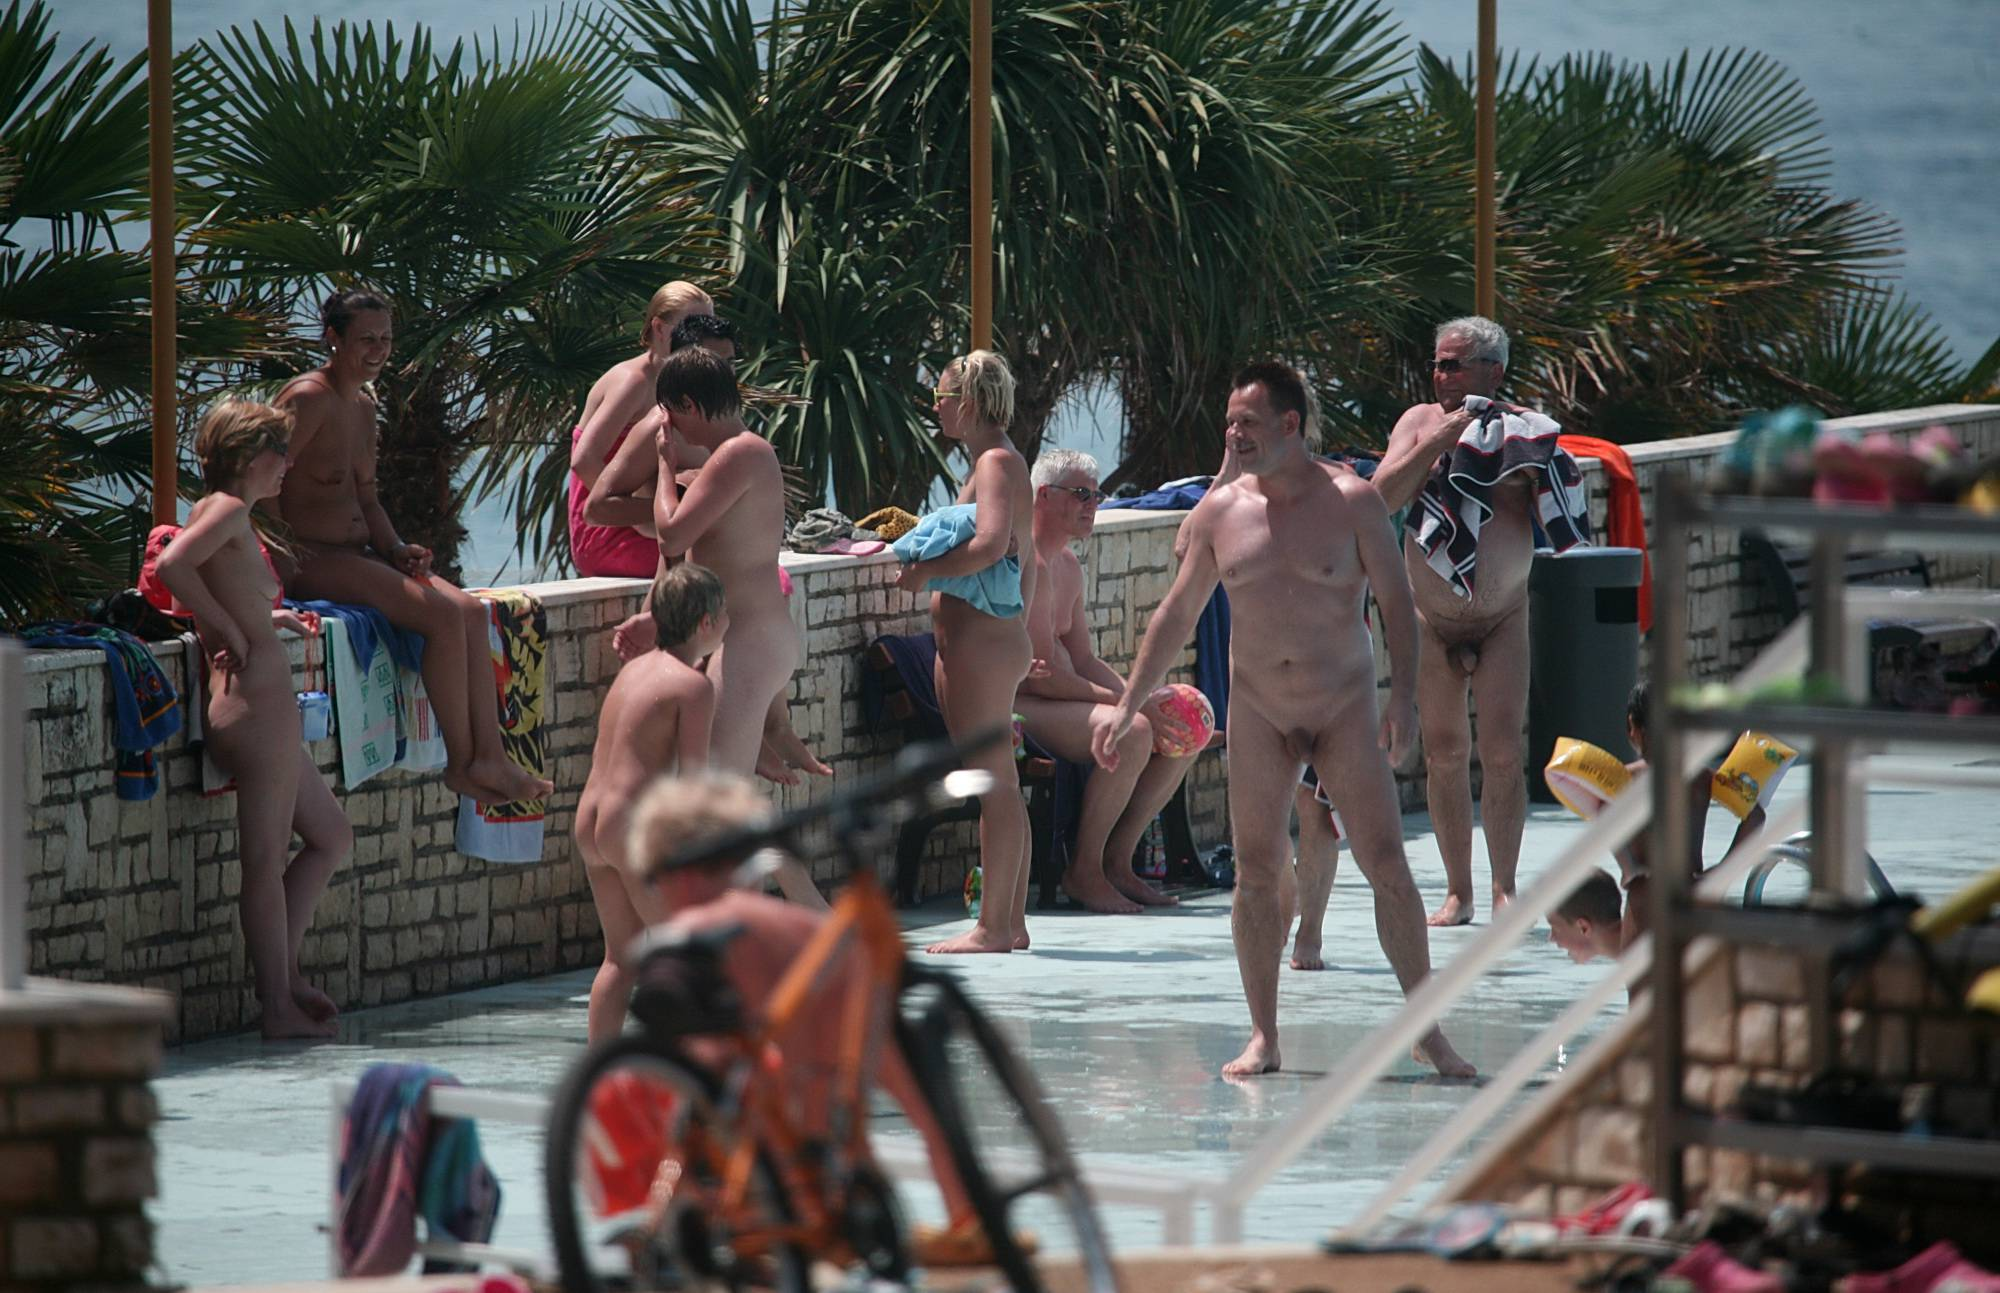 Nudist Pics Biking At Edge Of The Pool - 2